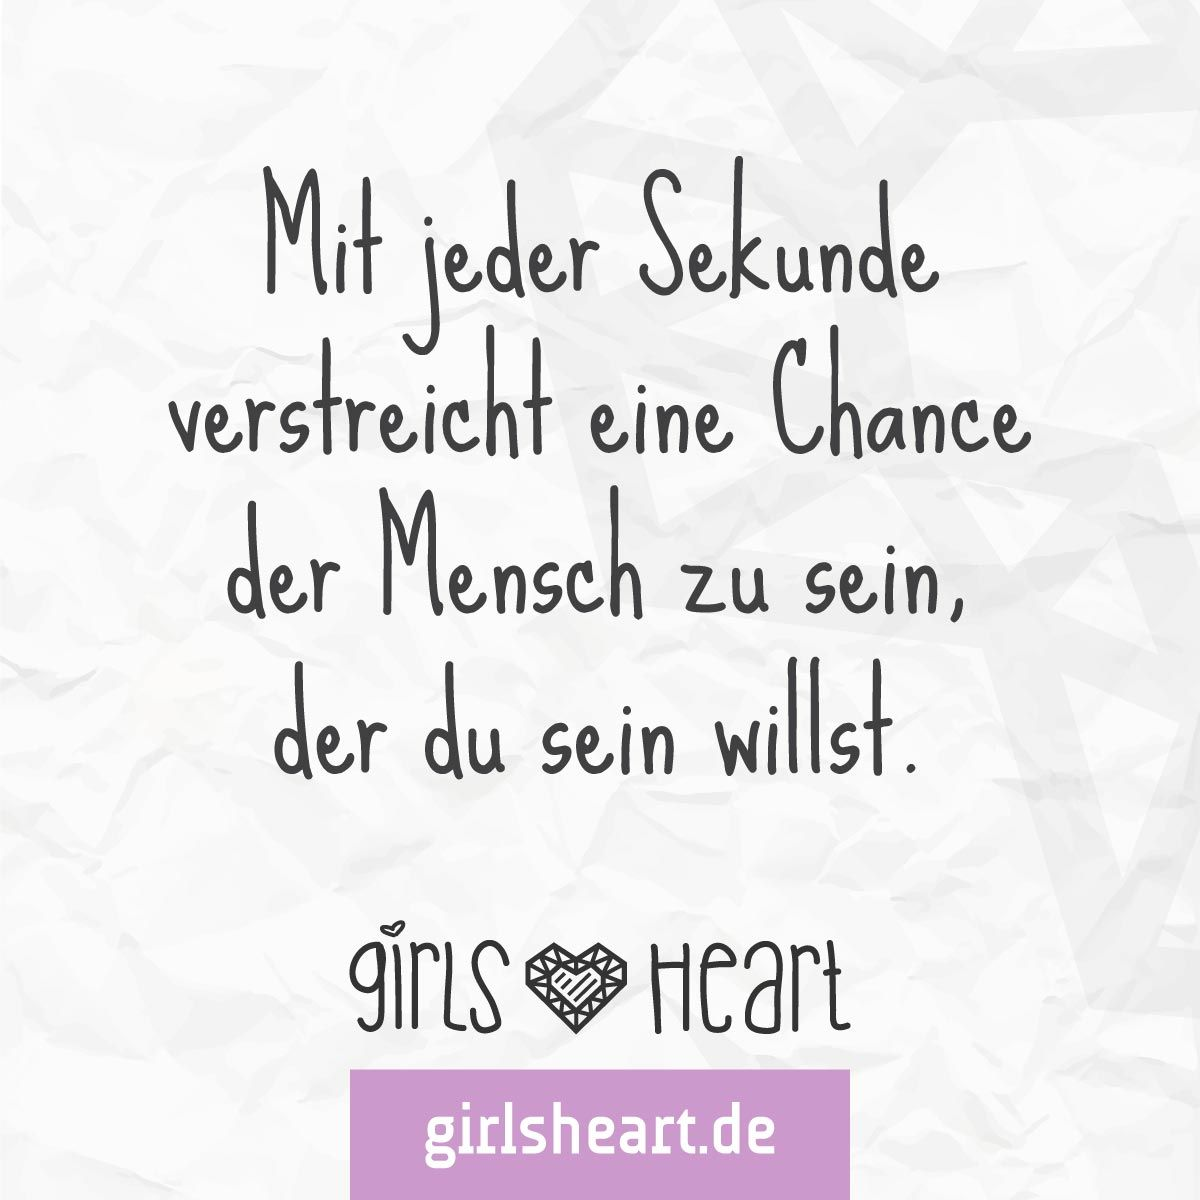 mehr sprüche auf: www.girlsheart.de #leben #fahrstuhl #weg